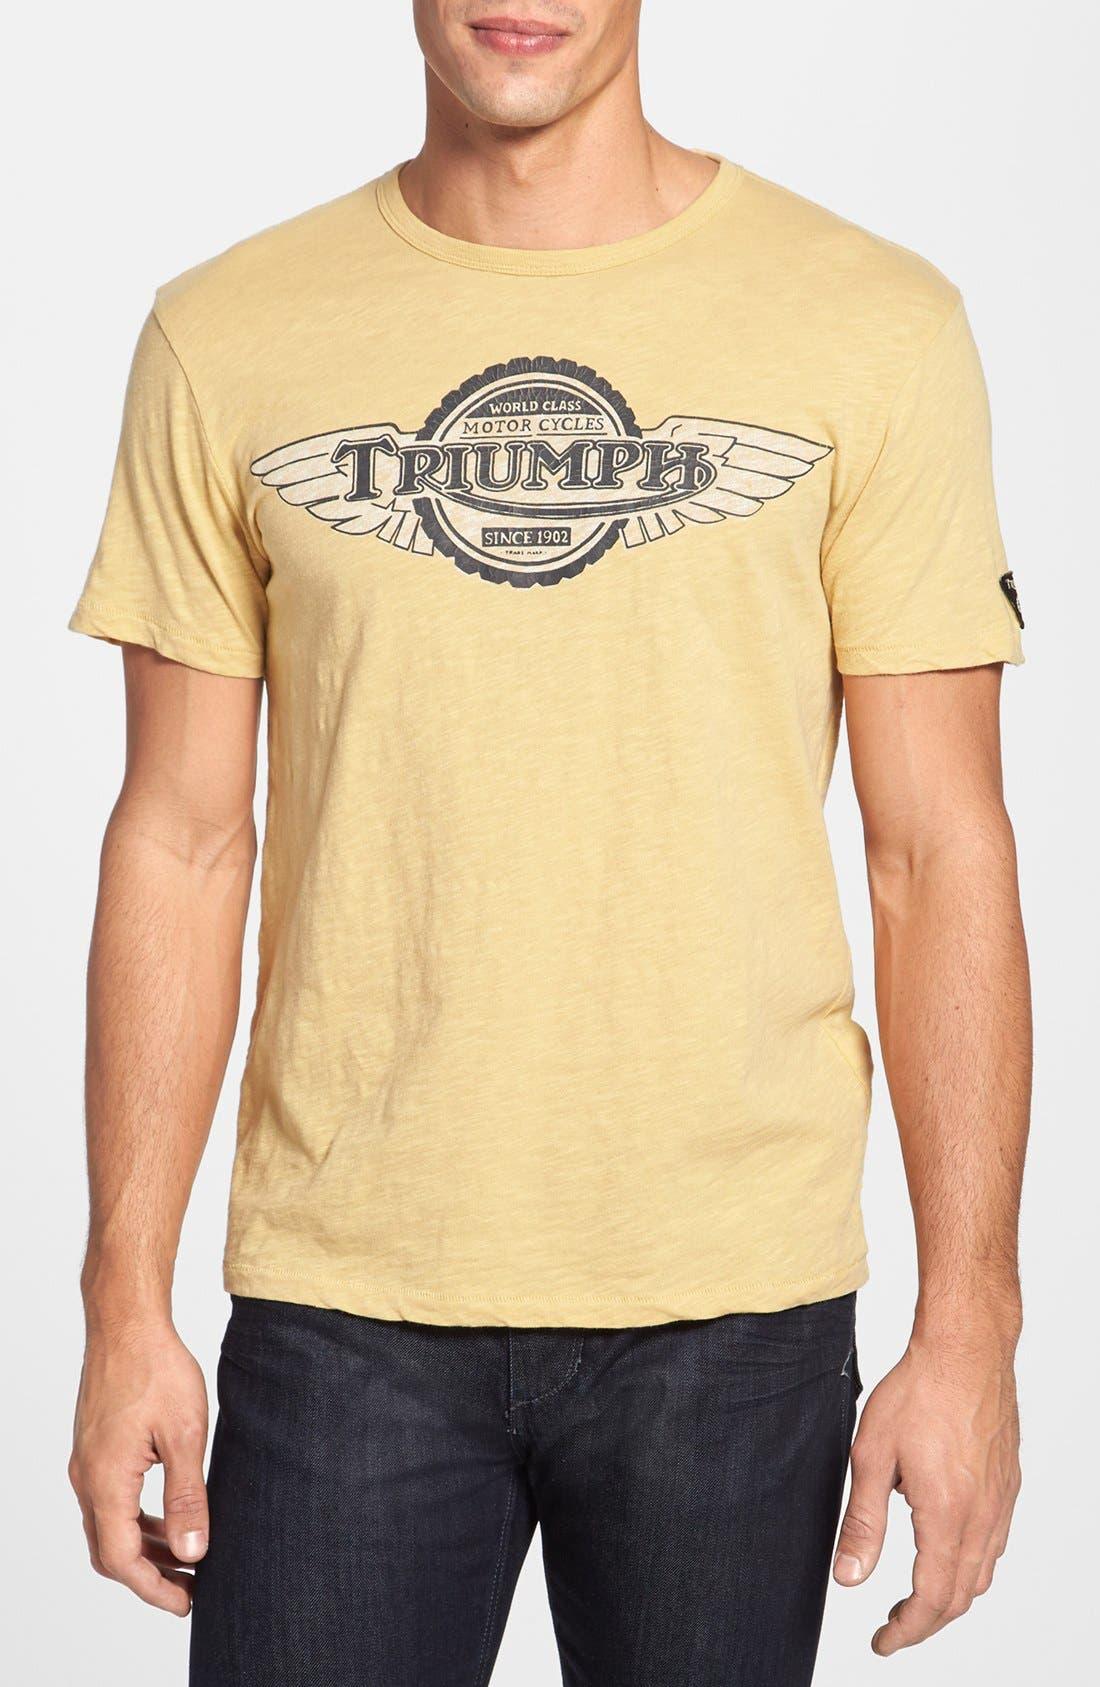 Main Image - Lucky Brand 'Triumph™' Graphic Crewneck T-Shirt